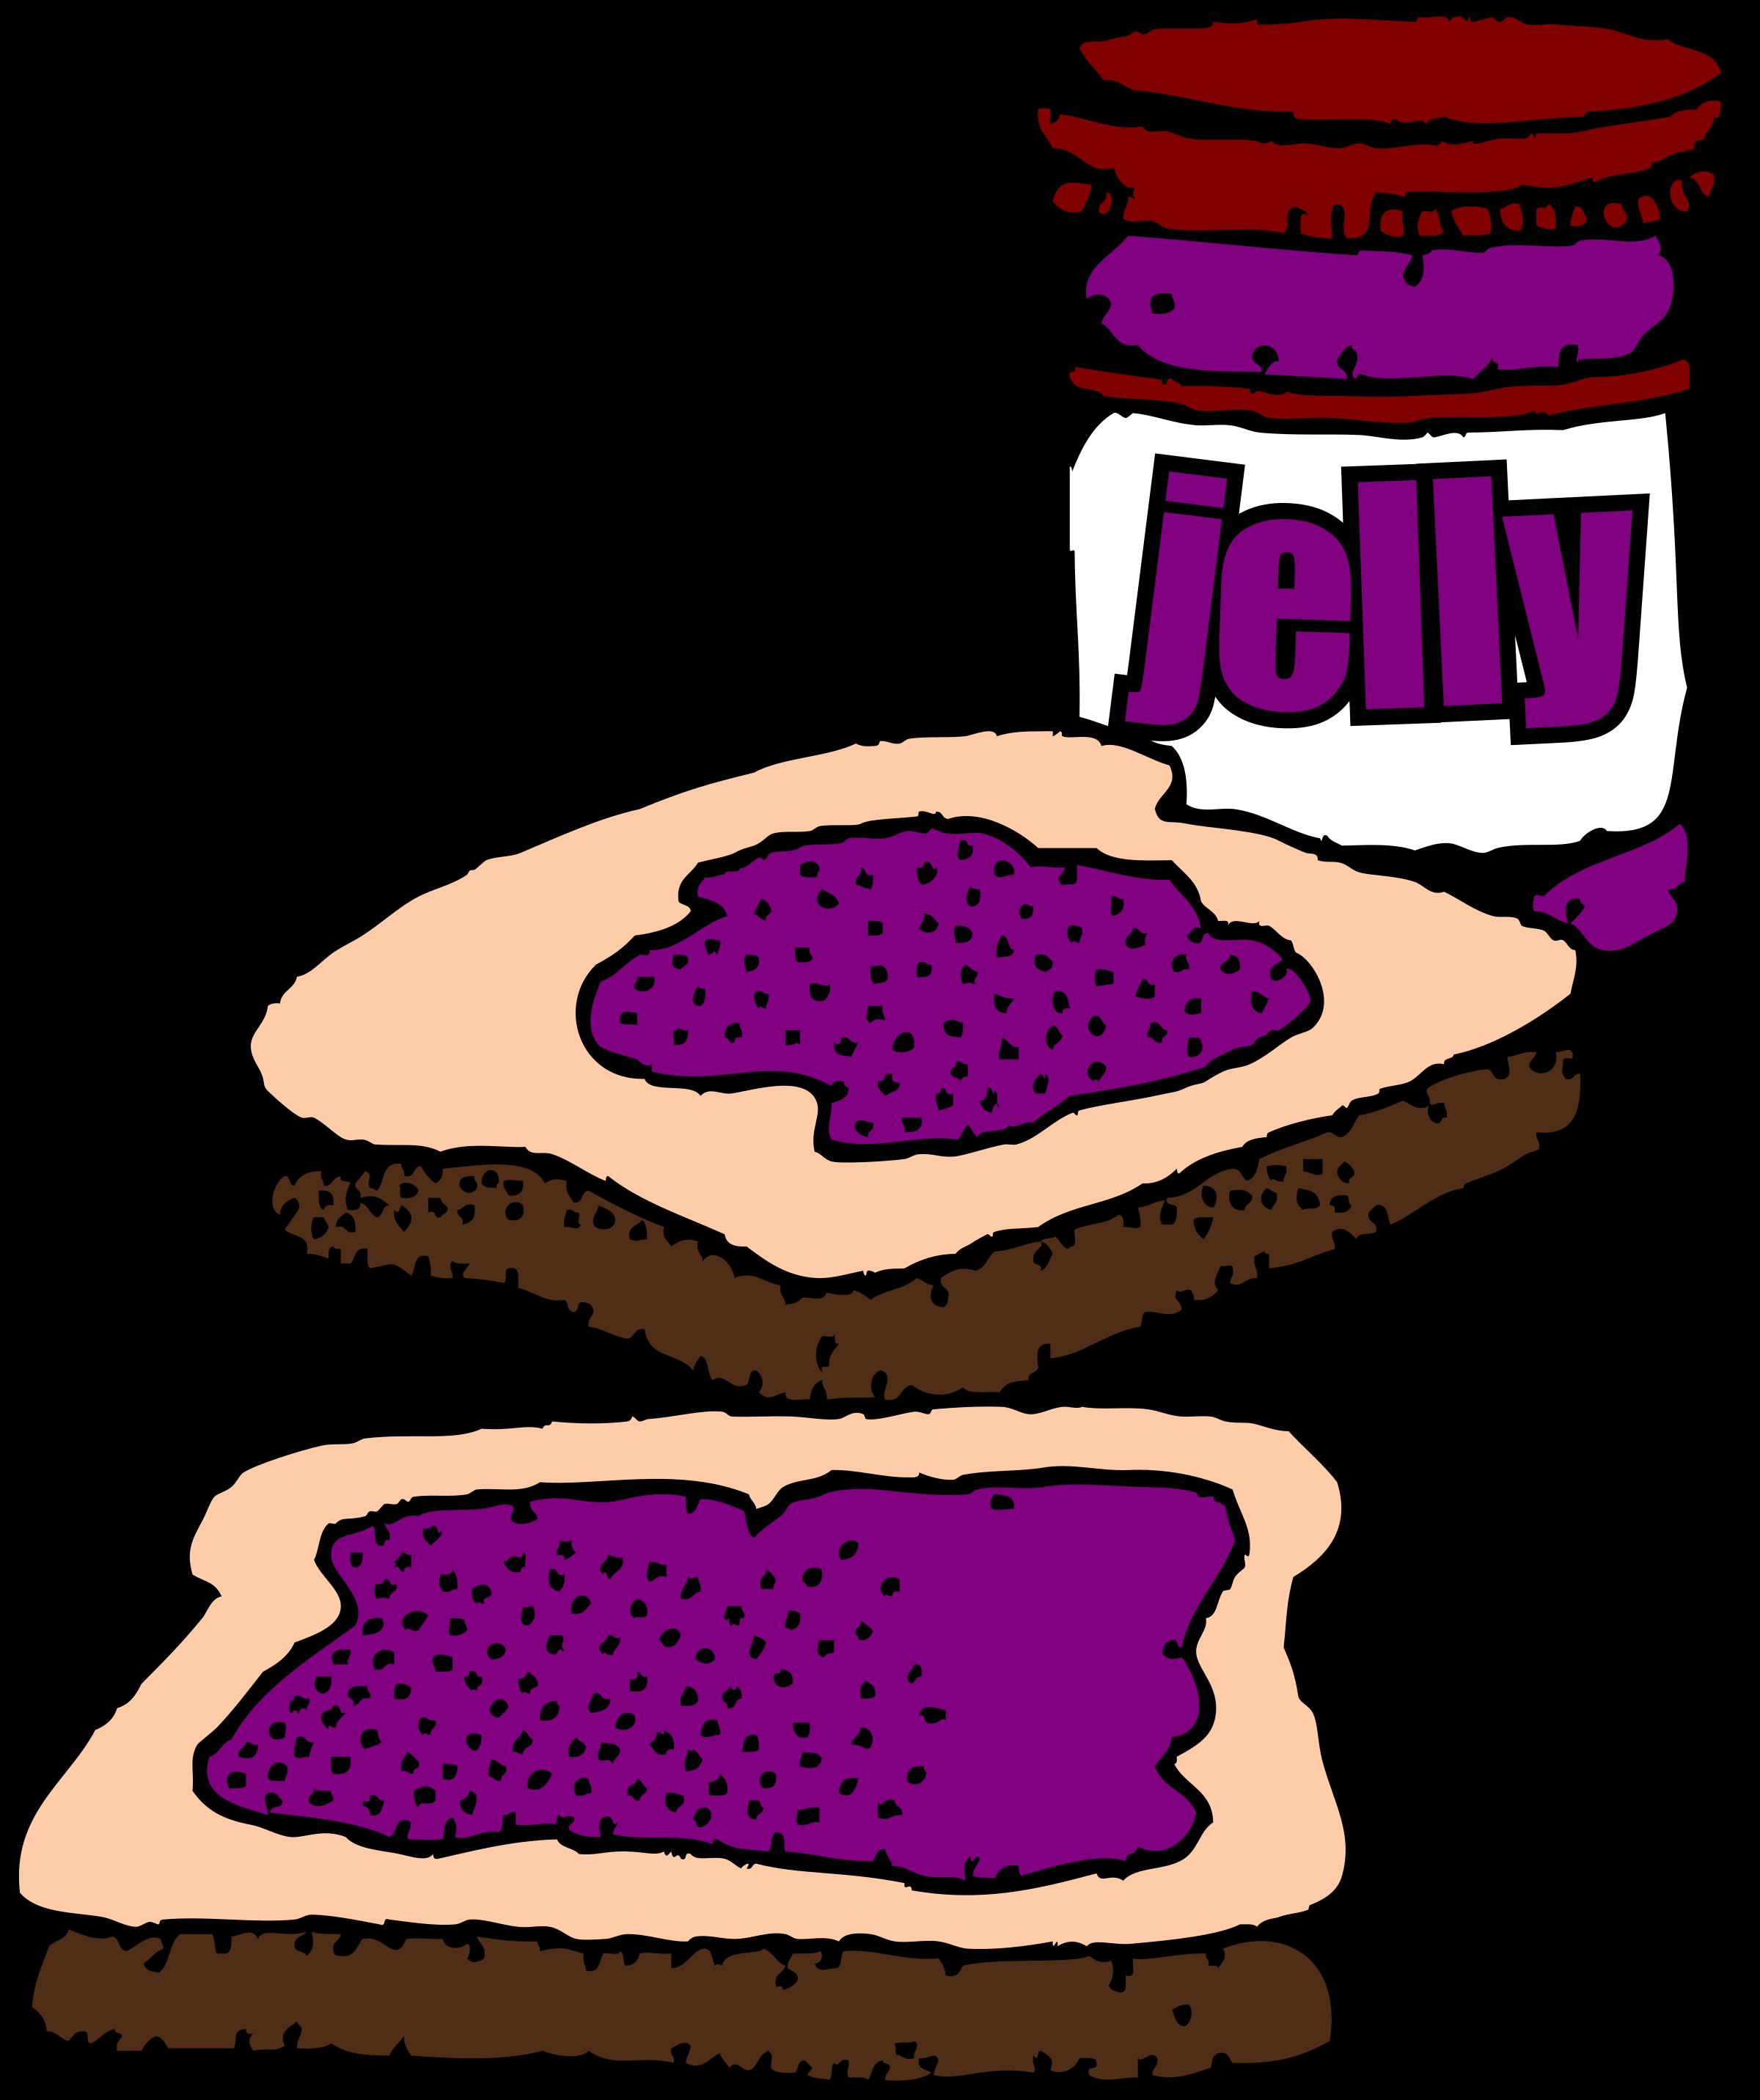 Peanut Butter and Jelly Jars. BIG IMAGE -Peanut Butter and Jelly Jars. BIG IMAGE (PNG)-19